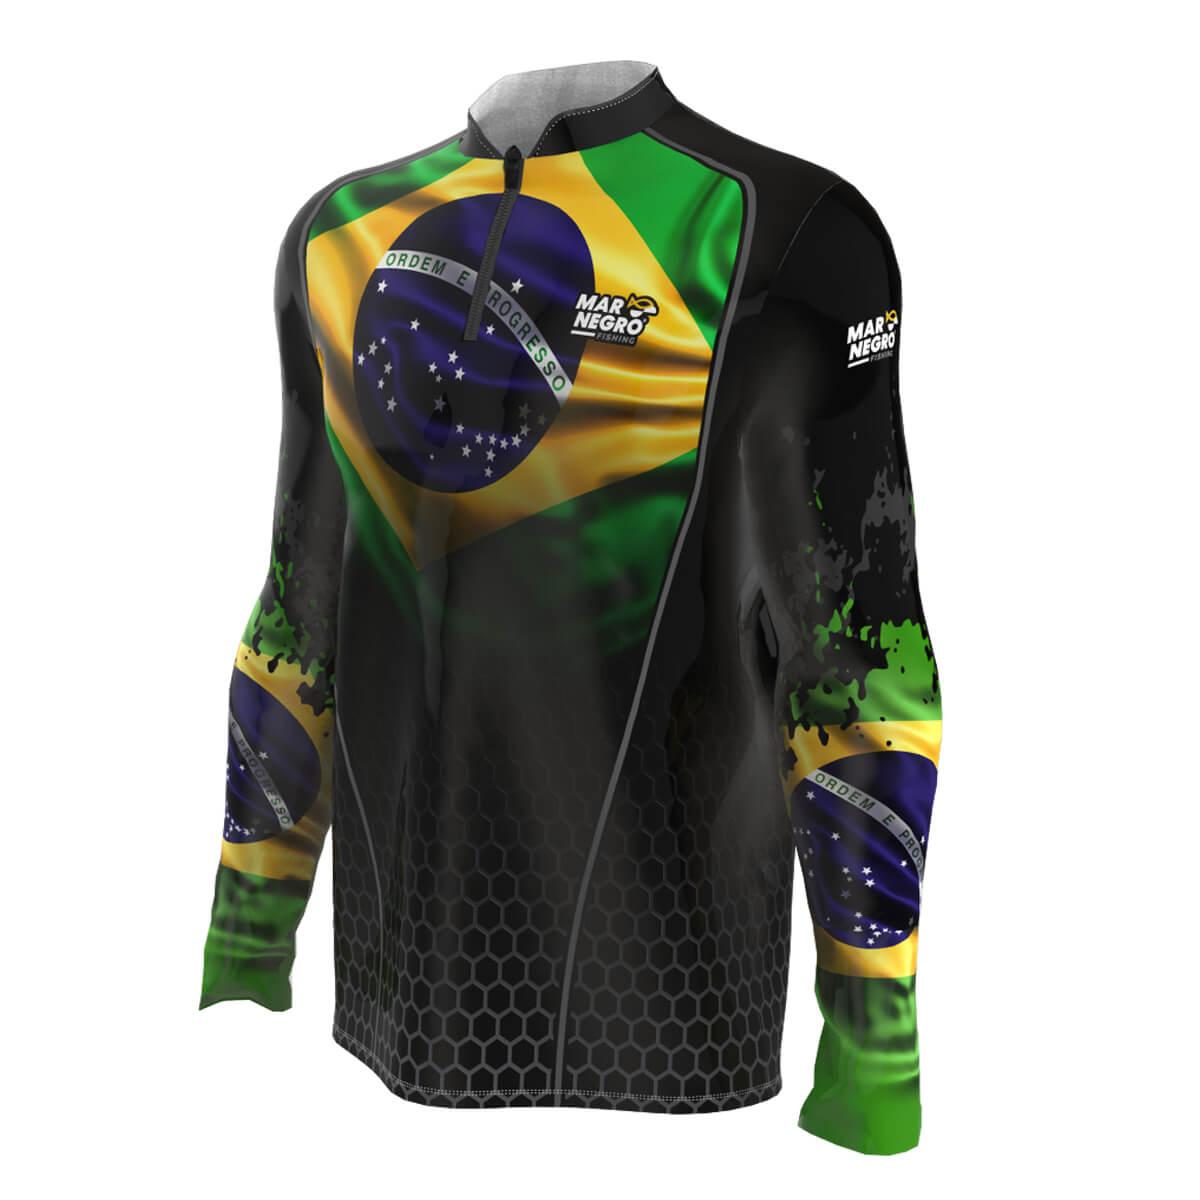 Camiseta Mar Negro 2021 Brasil  - Pró Pesca Shop